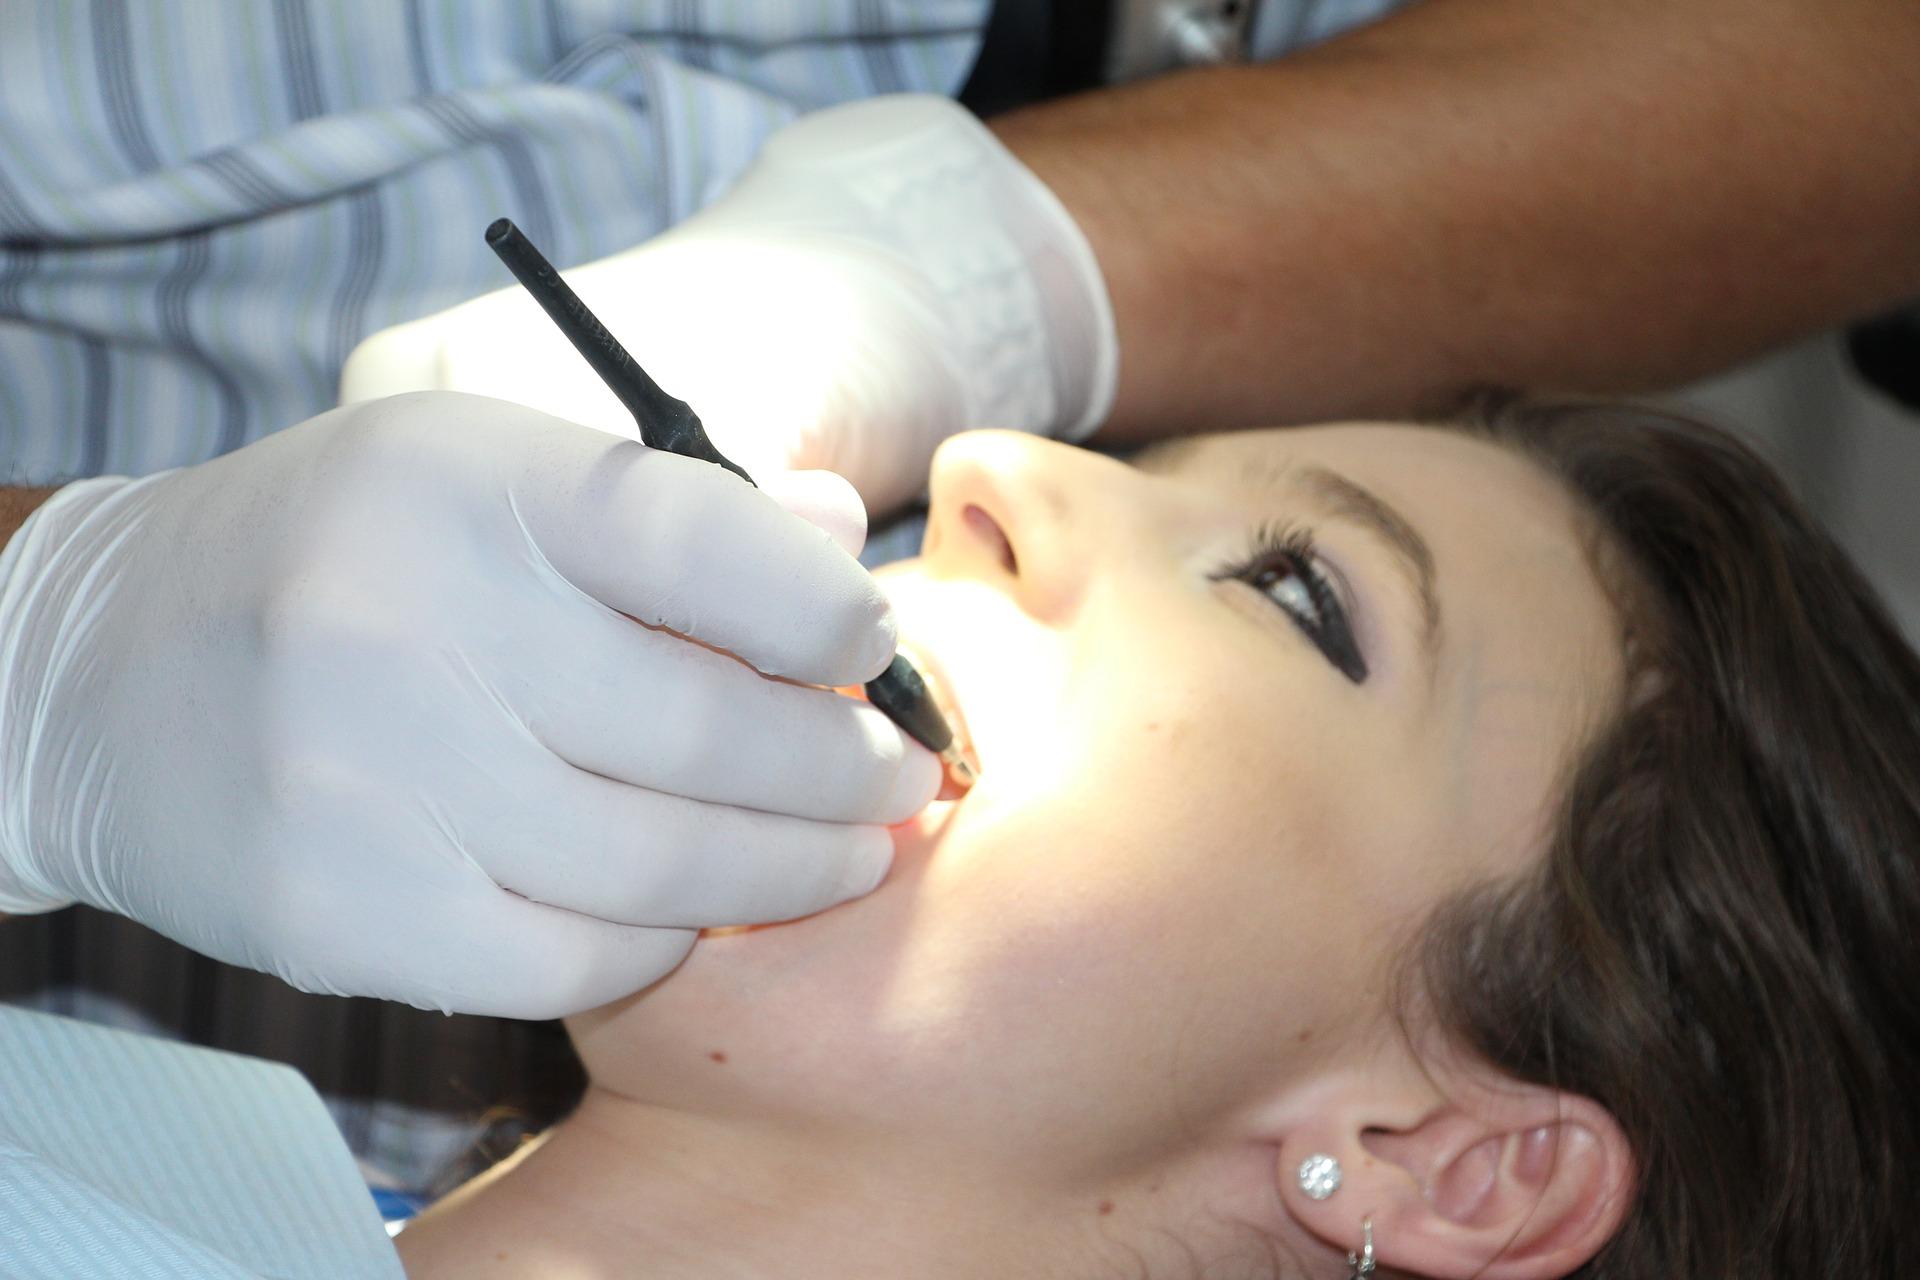 cabinet stomatologic din sector 6